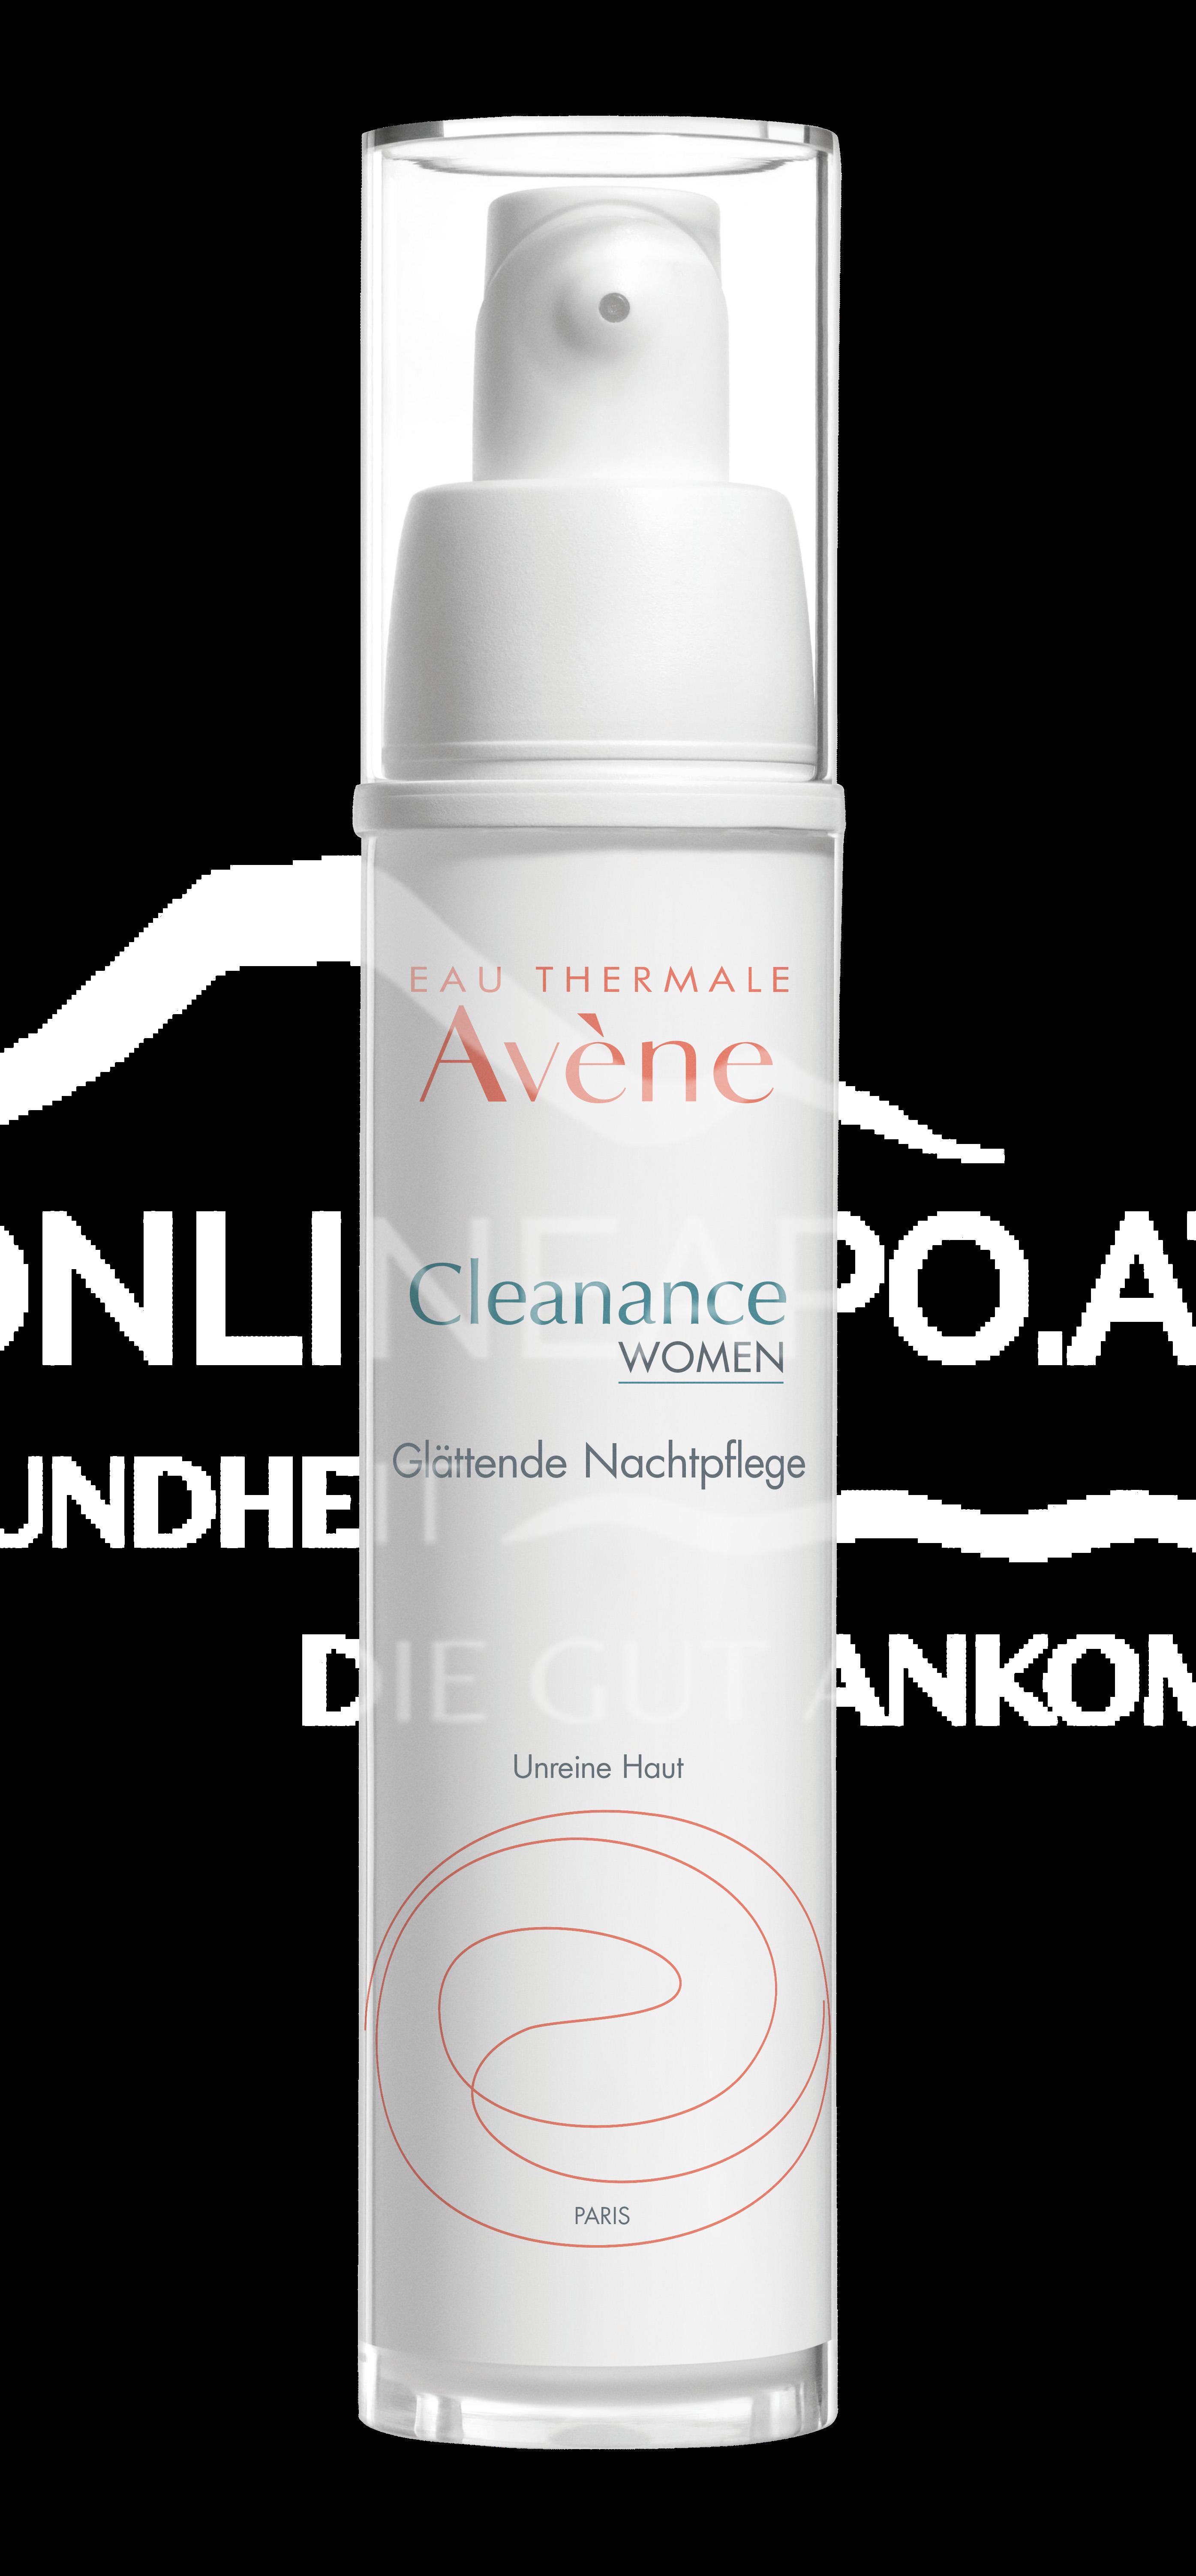 Avene Cleanance WOMEN Glättende Nachtpflege